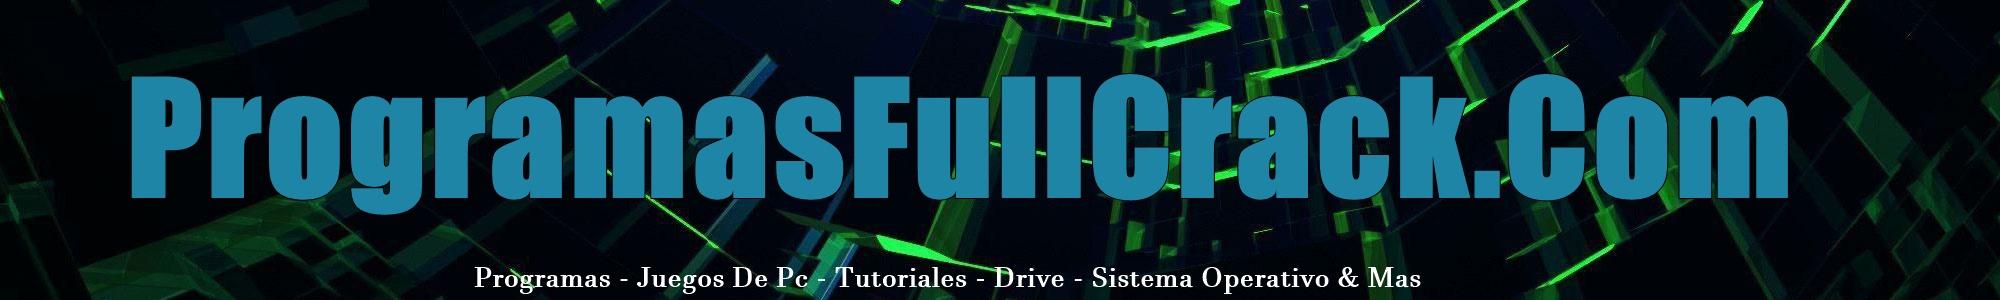 ProgramasFullCrack.com